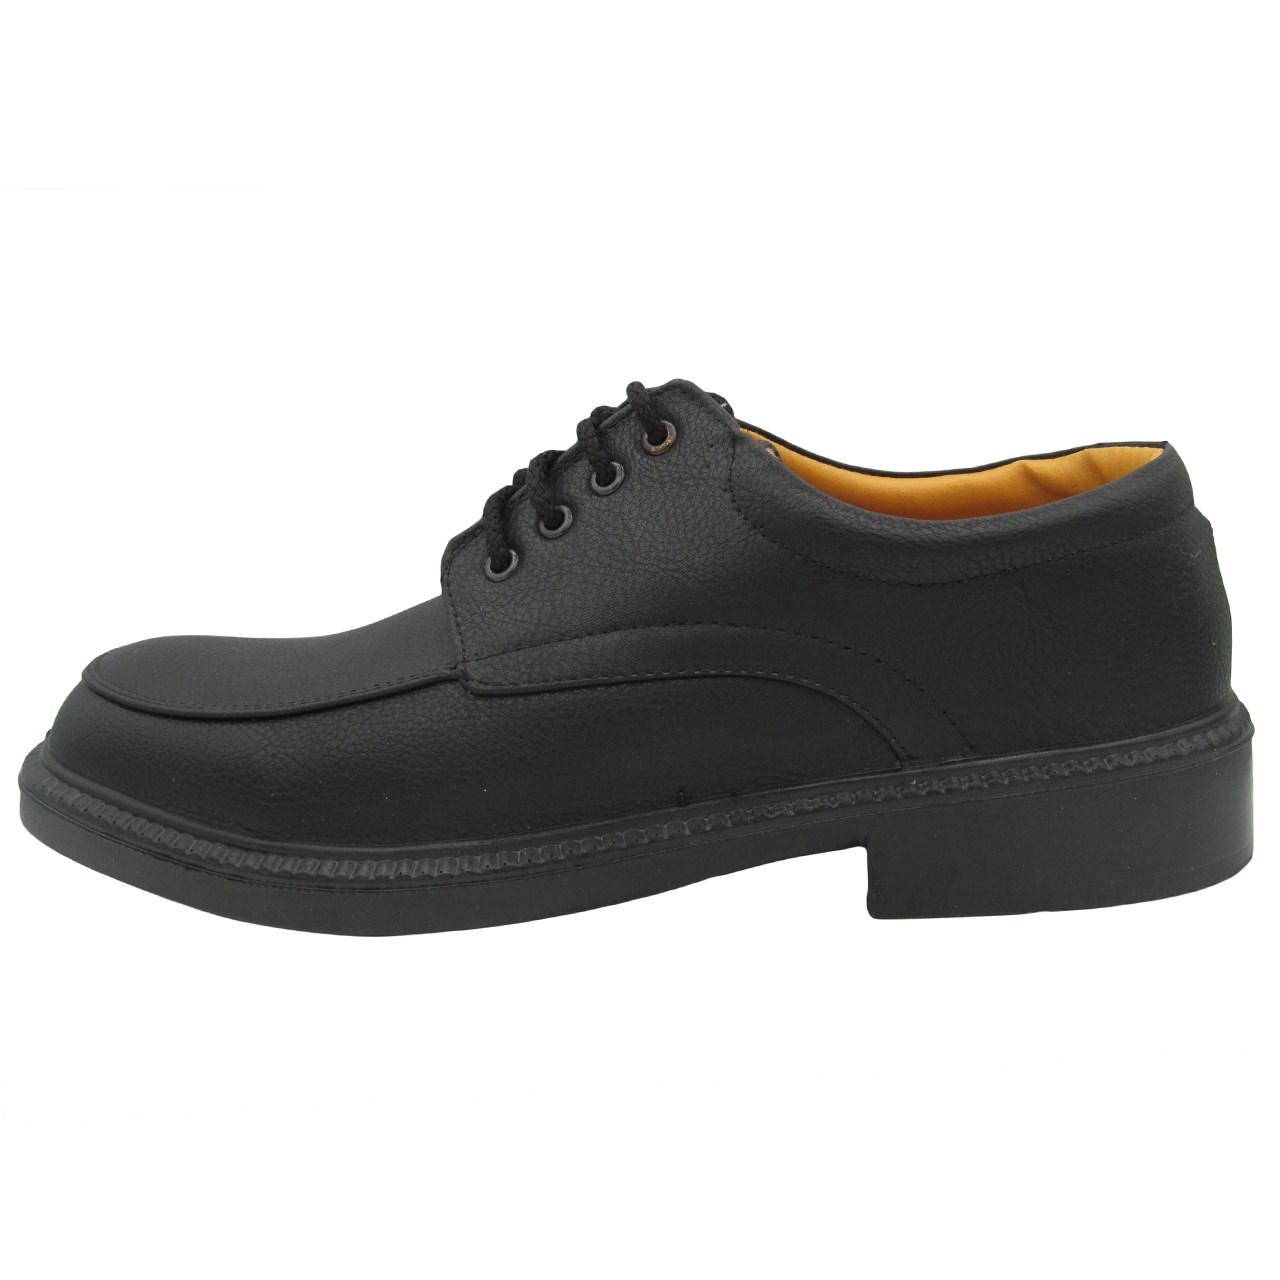 کفش مردانه پاما مدل ونکوور 162